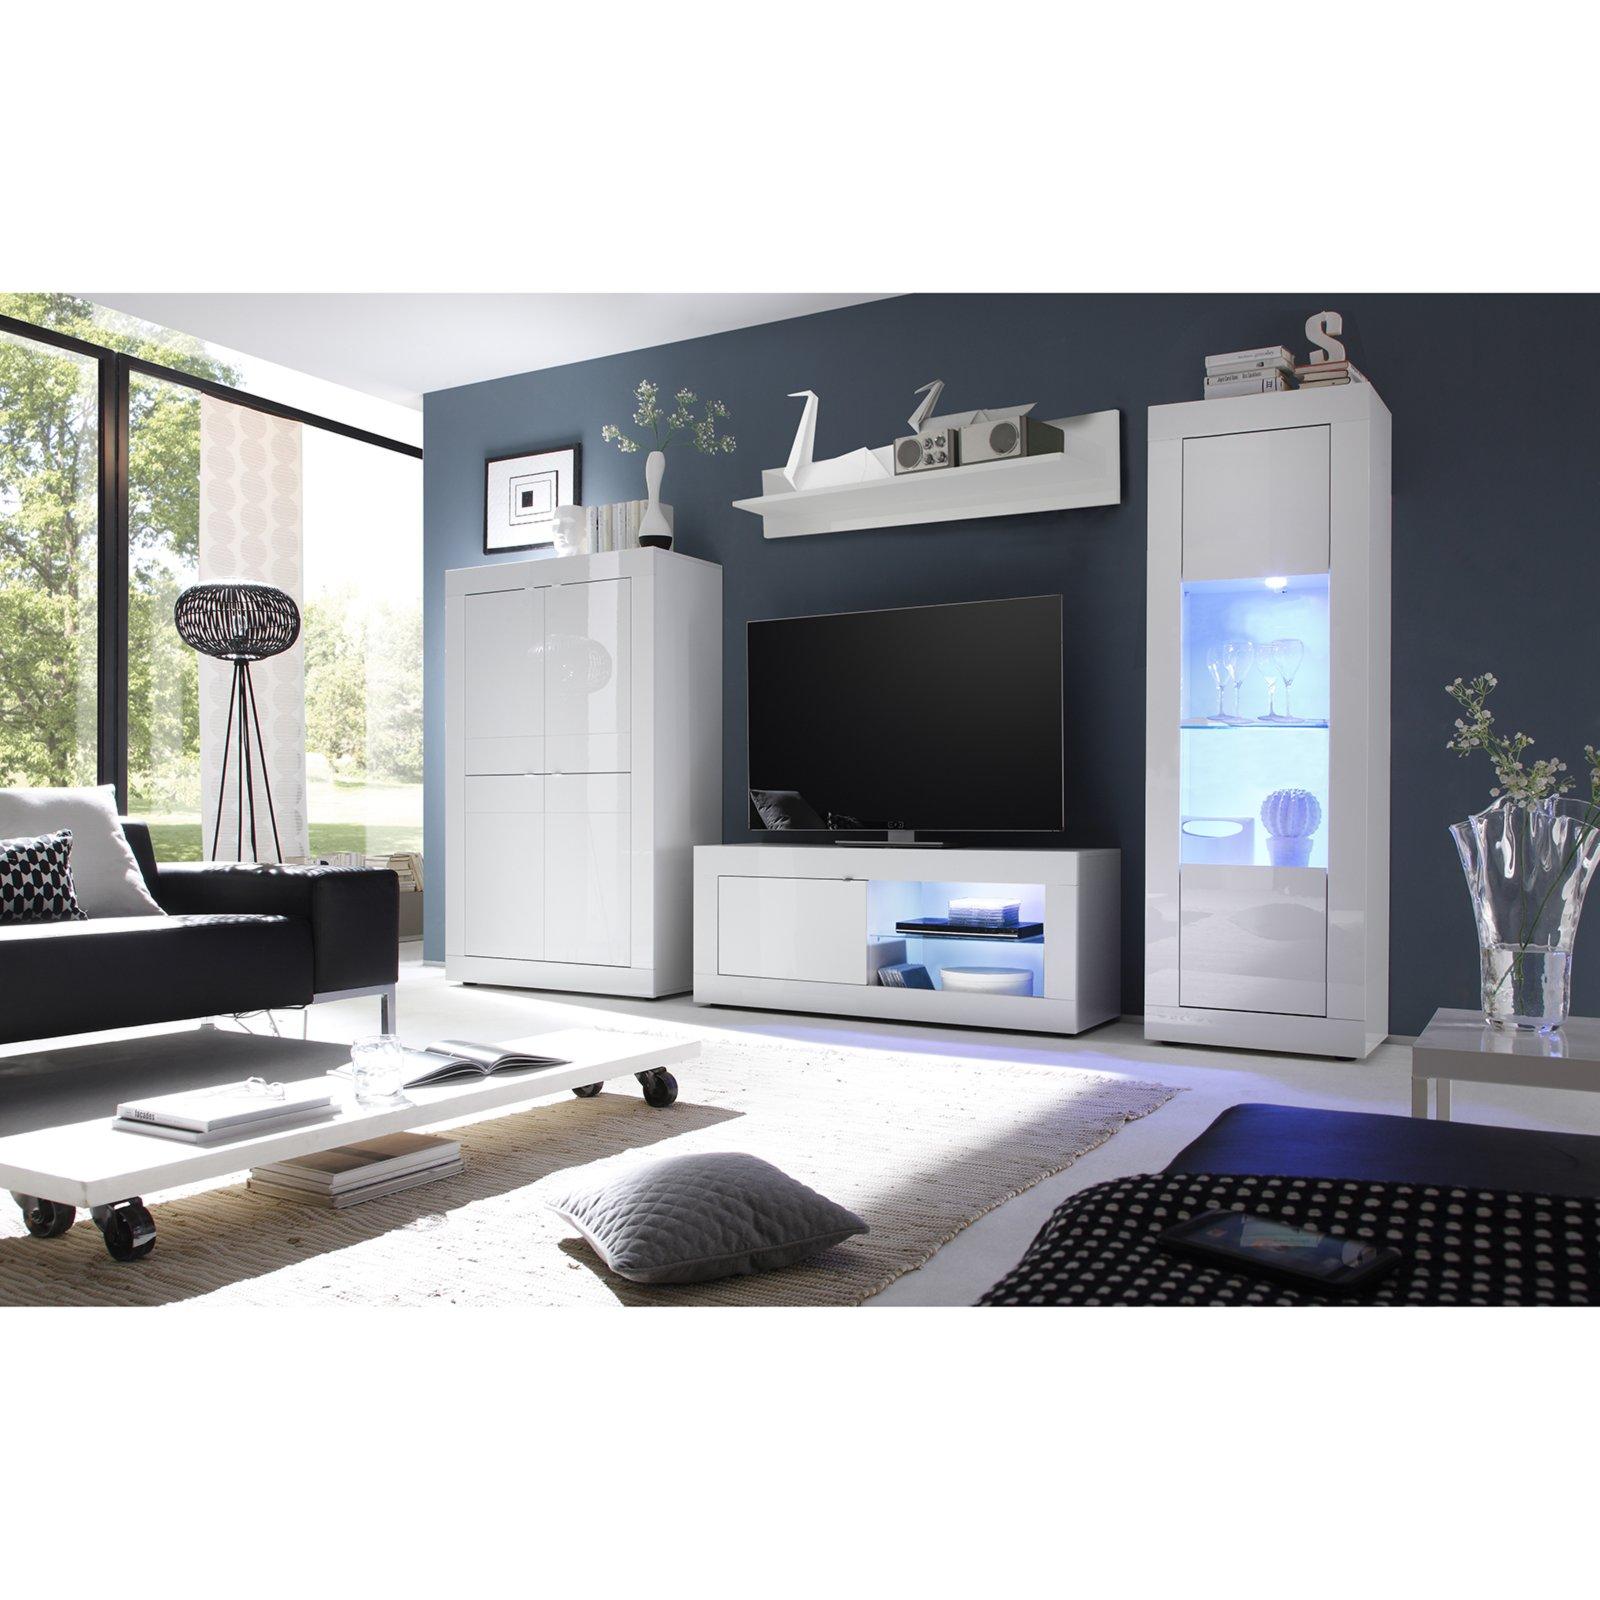 Tv Lowboard Weiss Hochglanz 140 Cm Breit